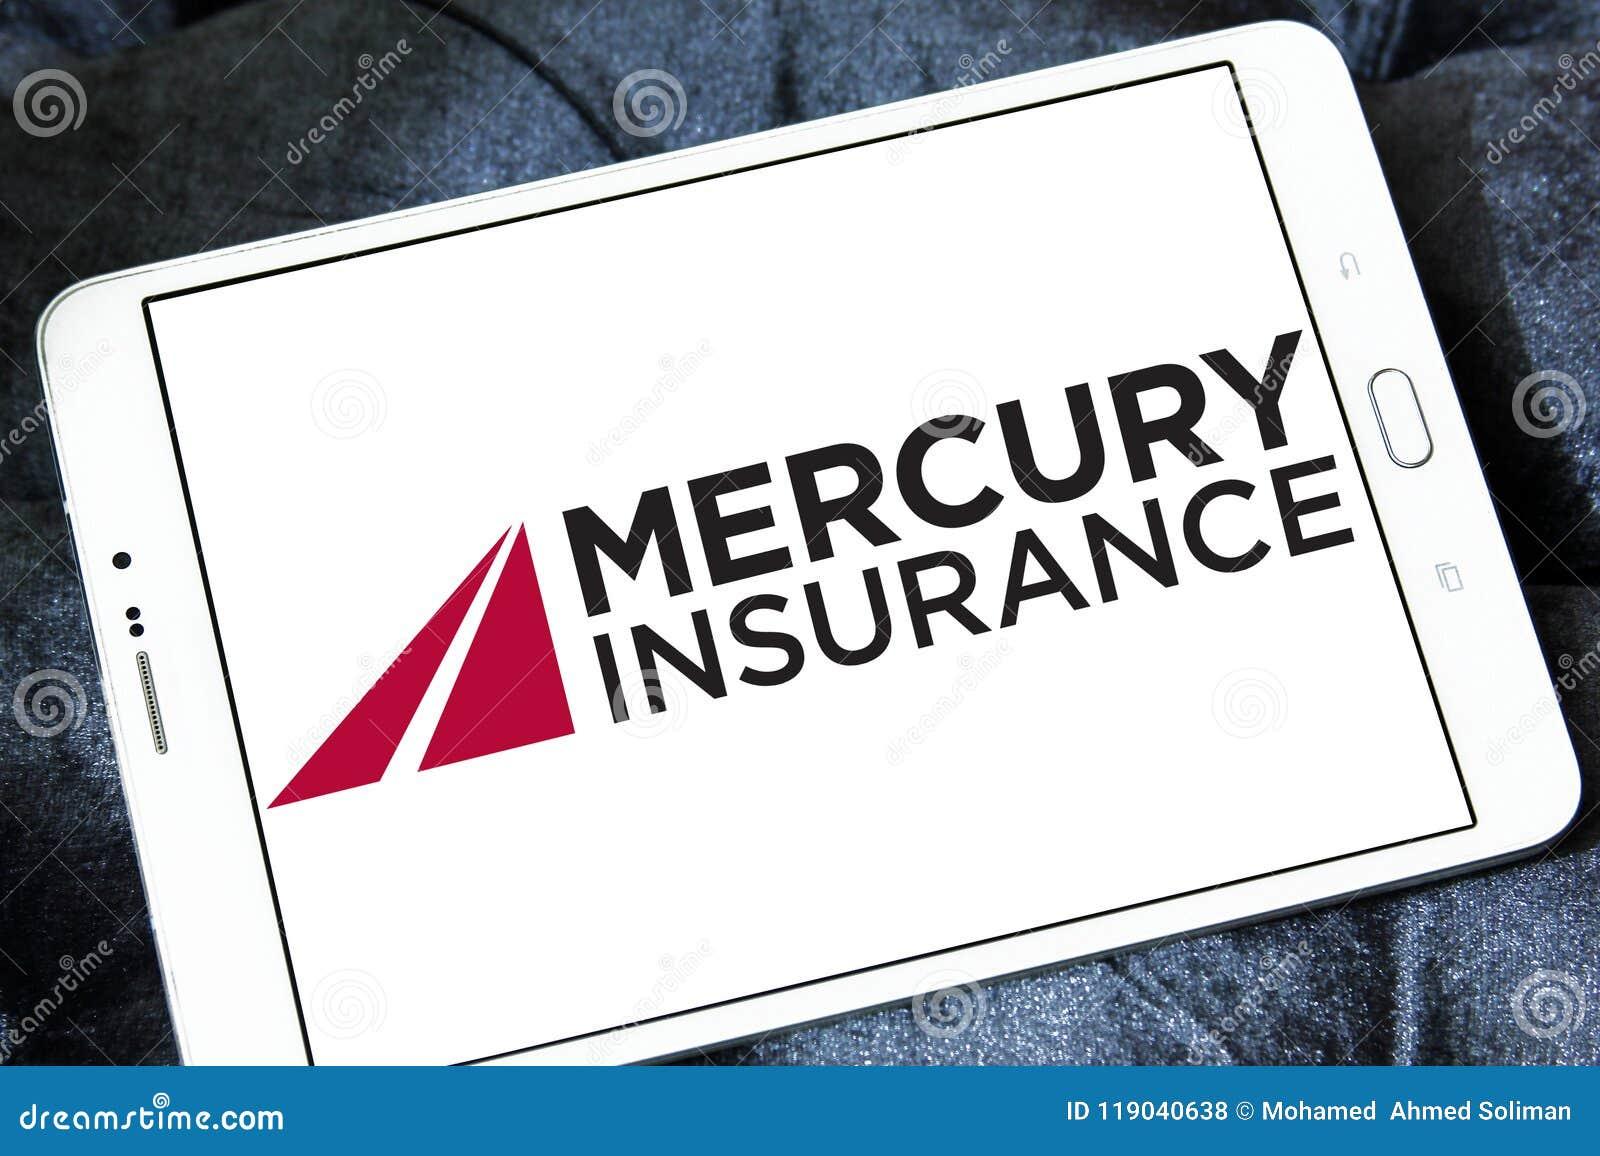 Mercury Insurance Group Logo Editorial Stock Photo - Image ...